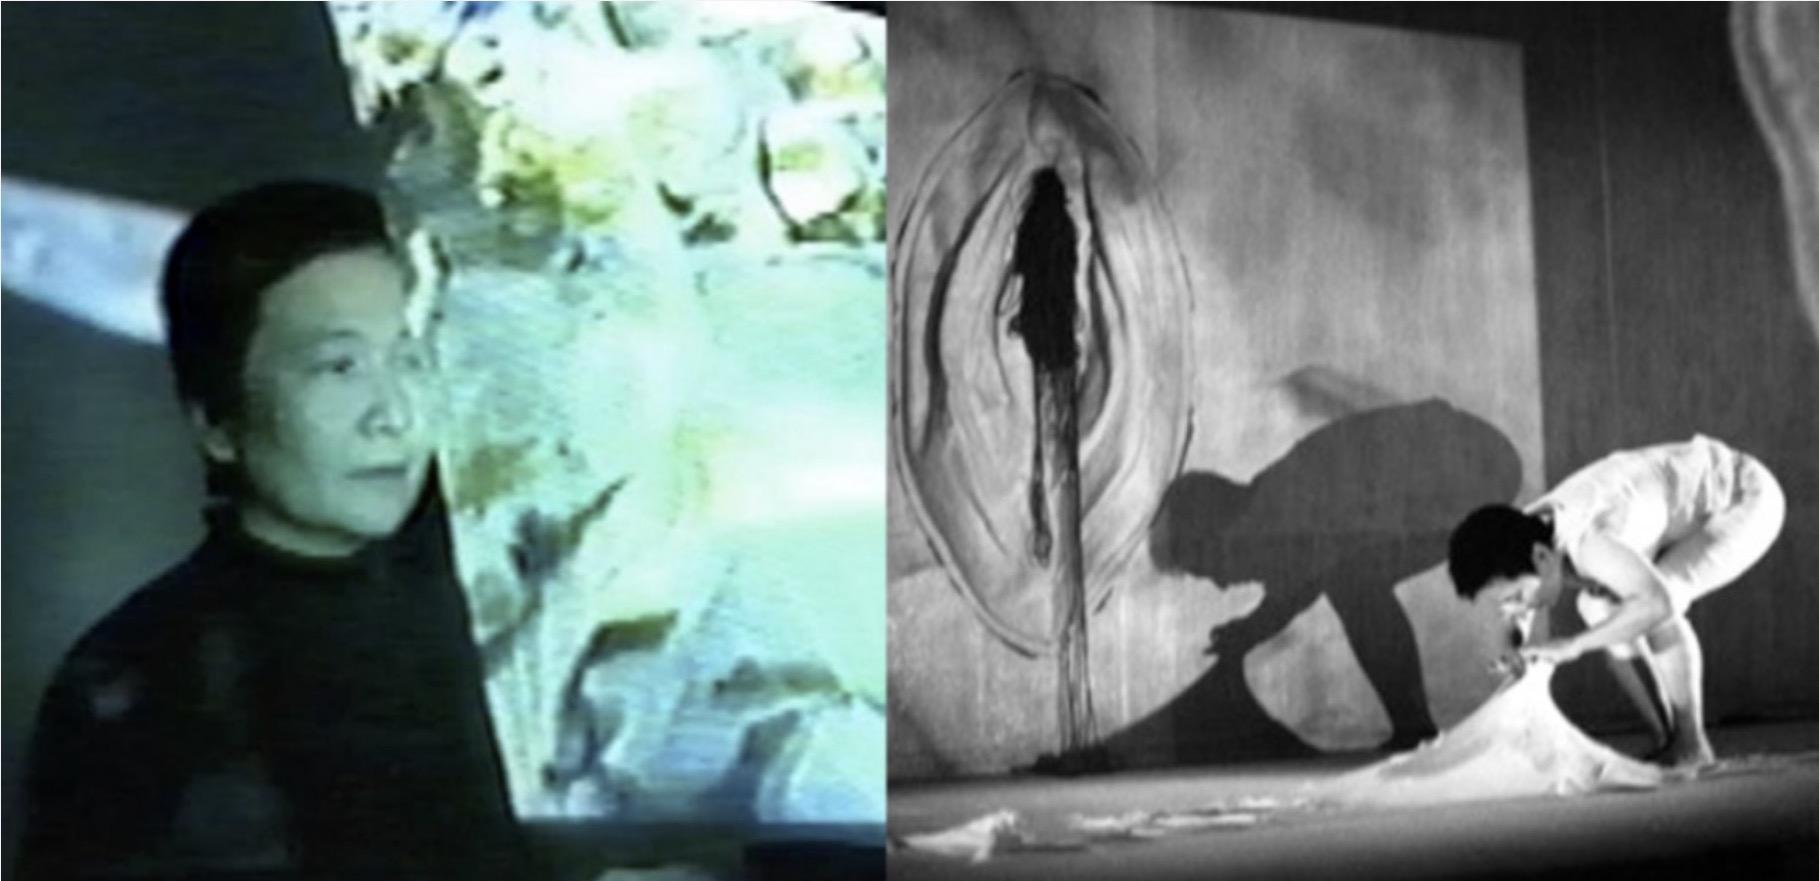 ipamia event 3  : アジアの女性アーティスト紹介 イトー・ターリ他  Asian Female Artists, Tari Ito and ..